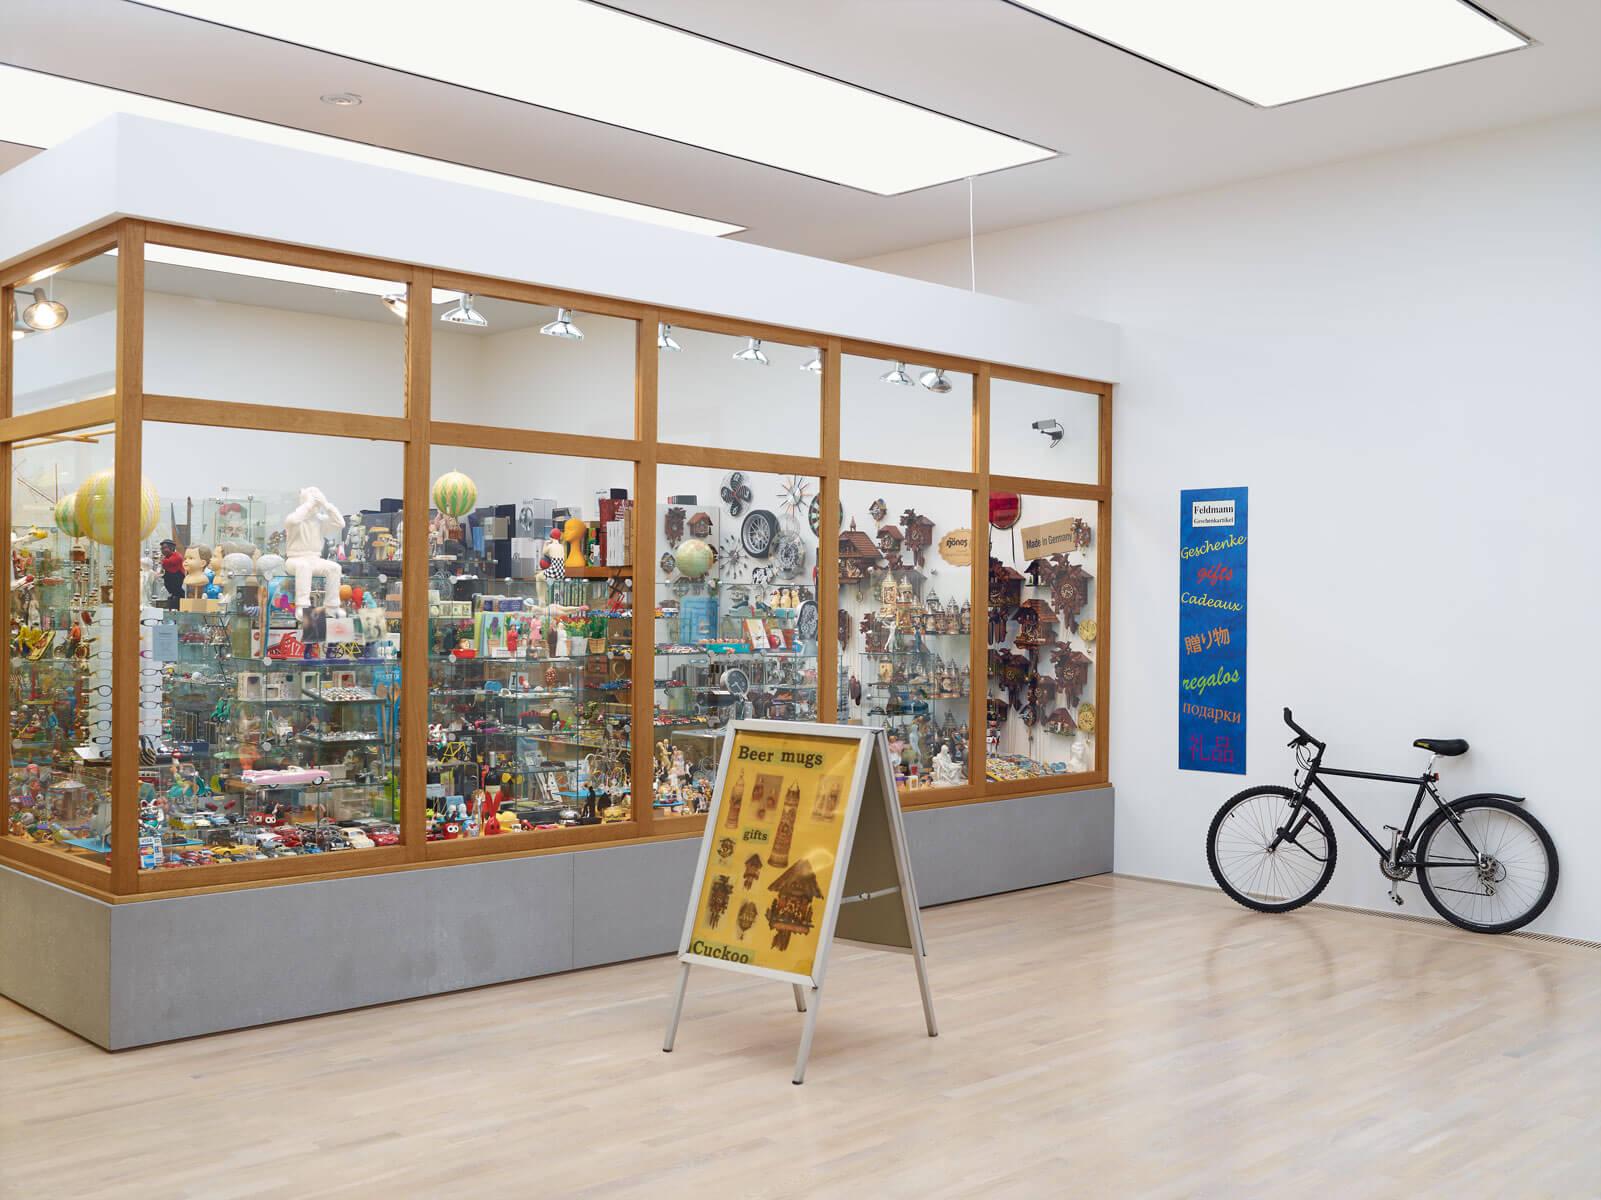 Lenbach haus: Laden, 1975-2015 |  | ProjecteSD